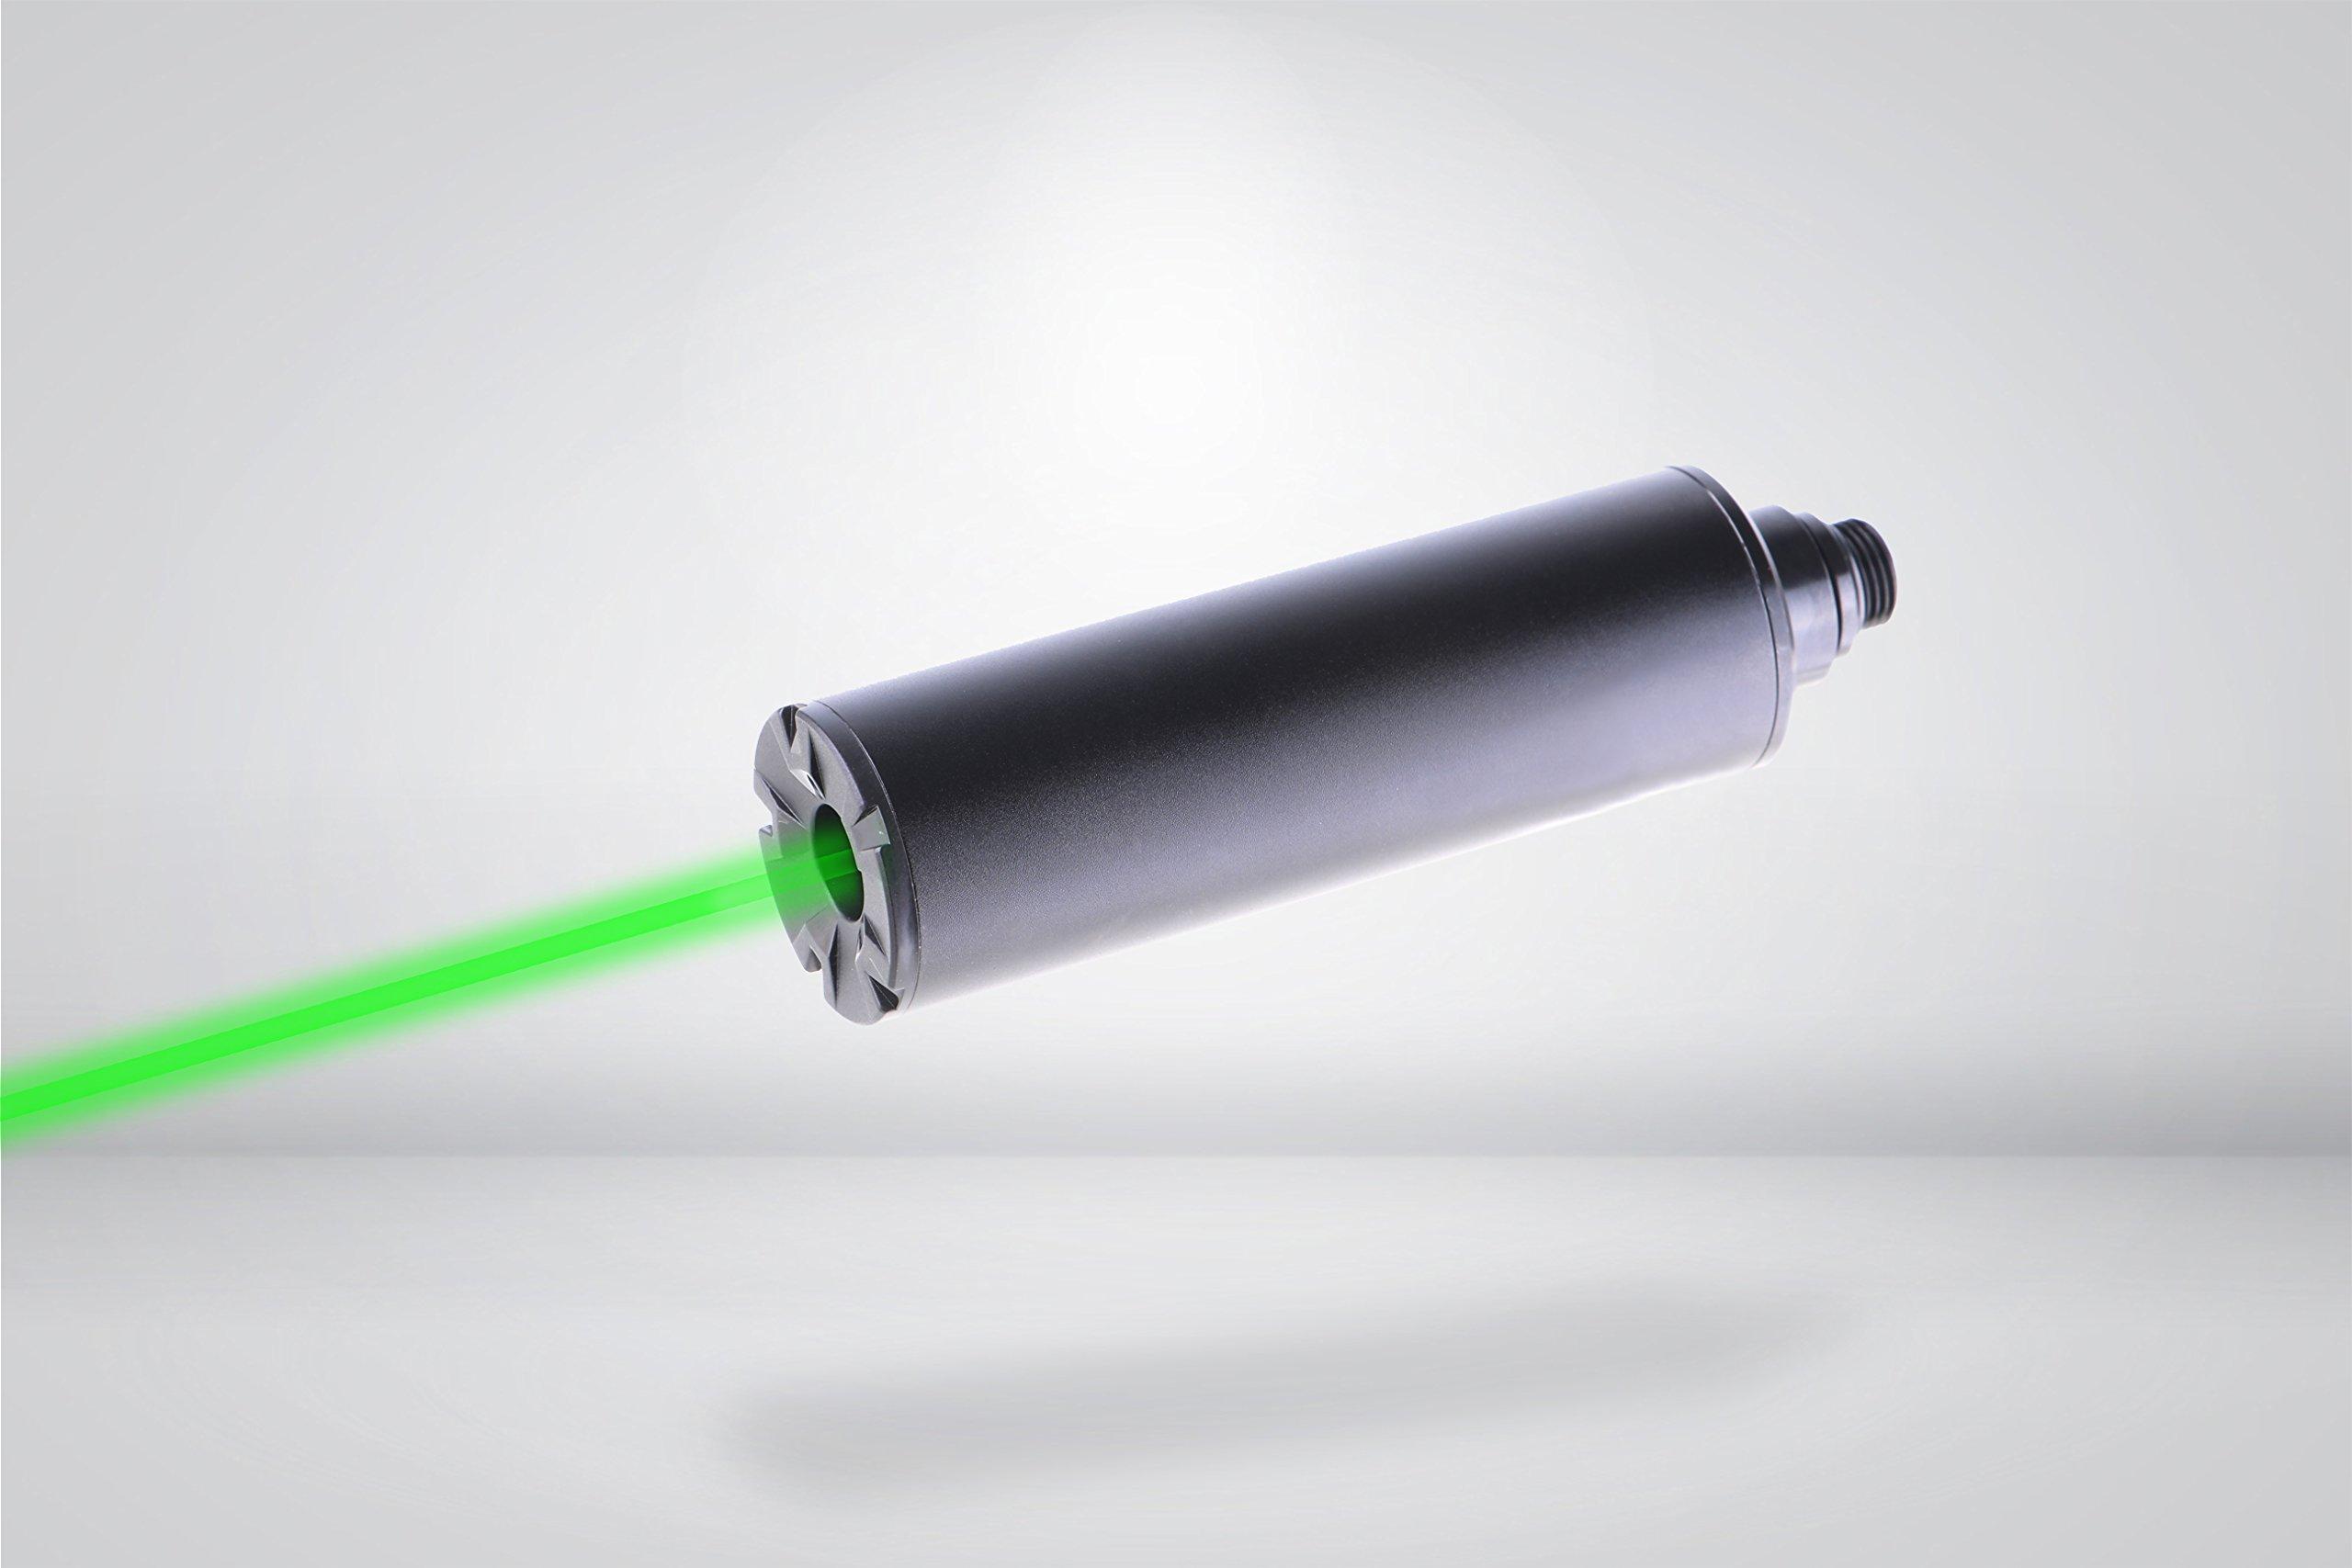 ACETECH Airsoft Gun 14mm Lighter Pistol Tracer Unit Glow in Dark (No Sheath)